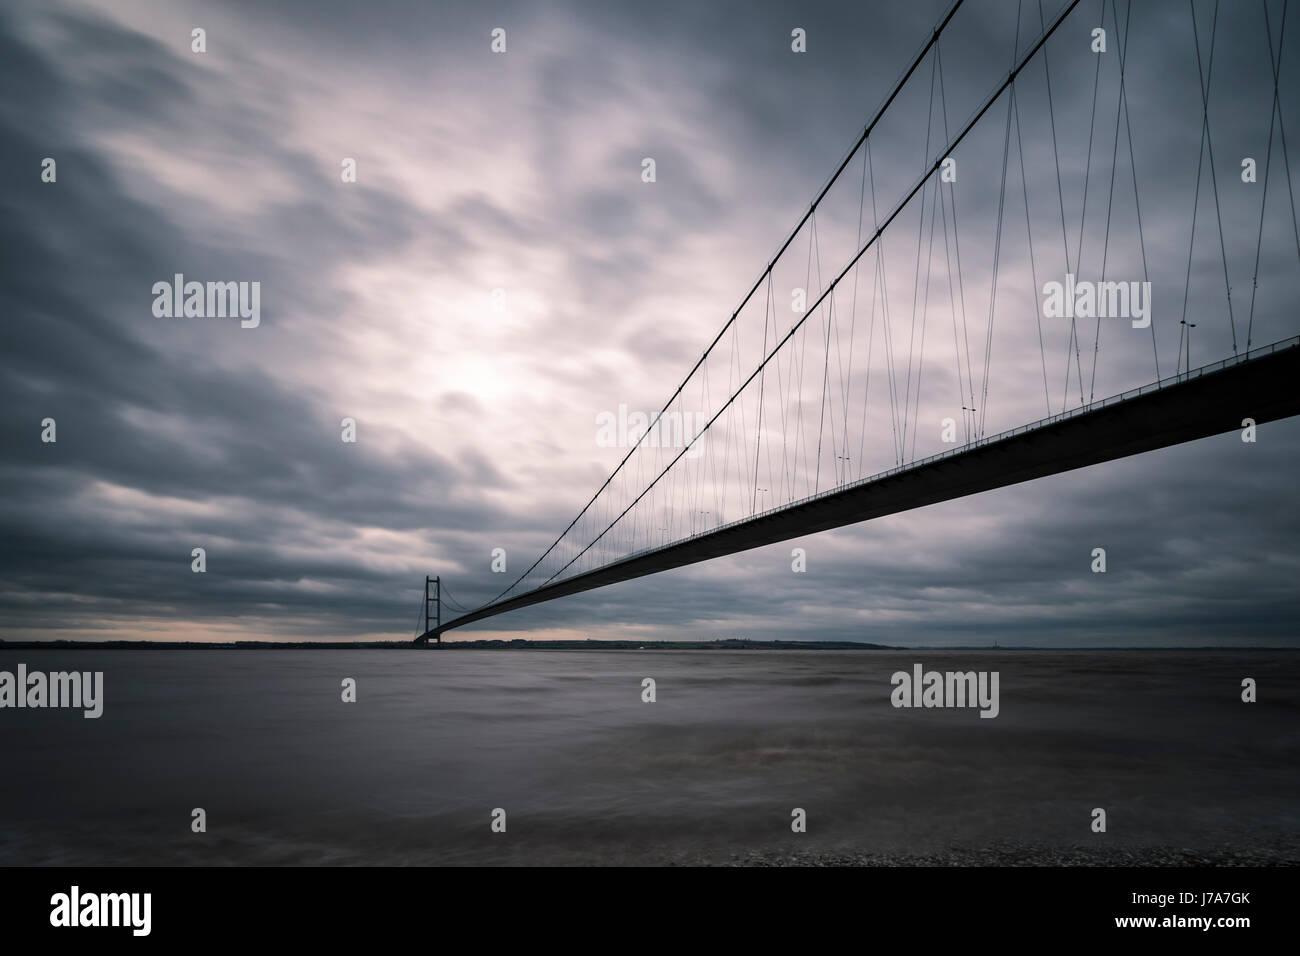 Humber Bridge, Single Span Suspension Bridge, near Kingston upon Hull, England, UK. Stock Photo